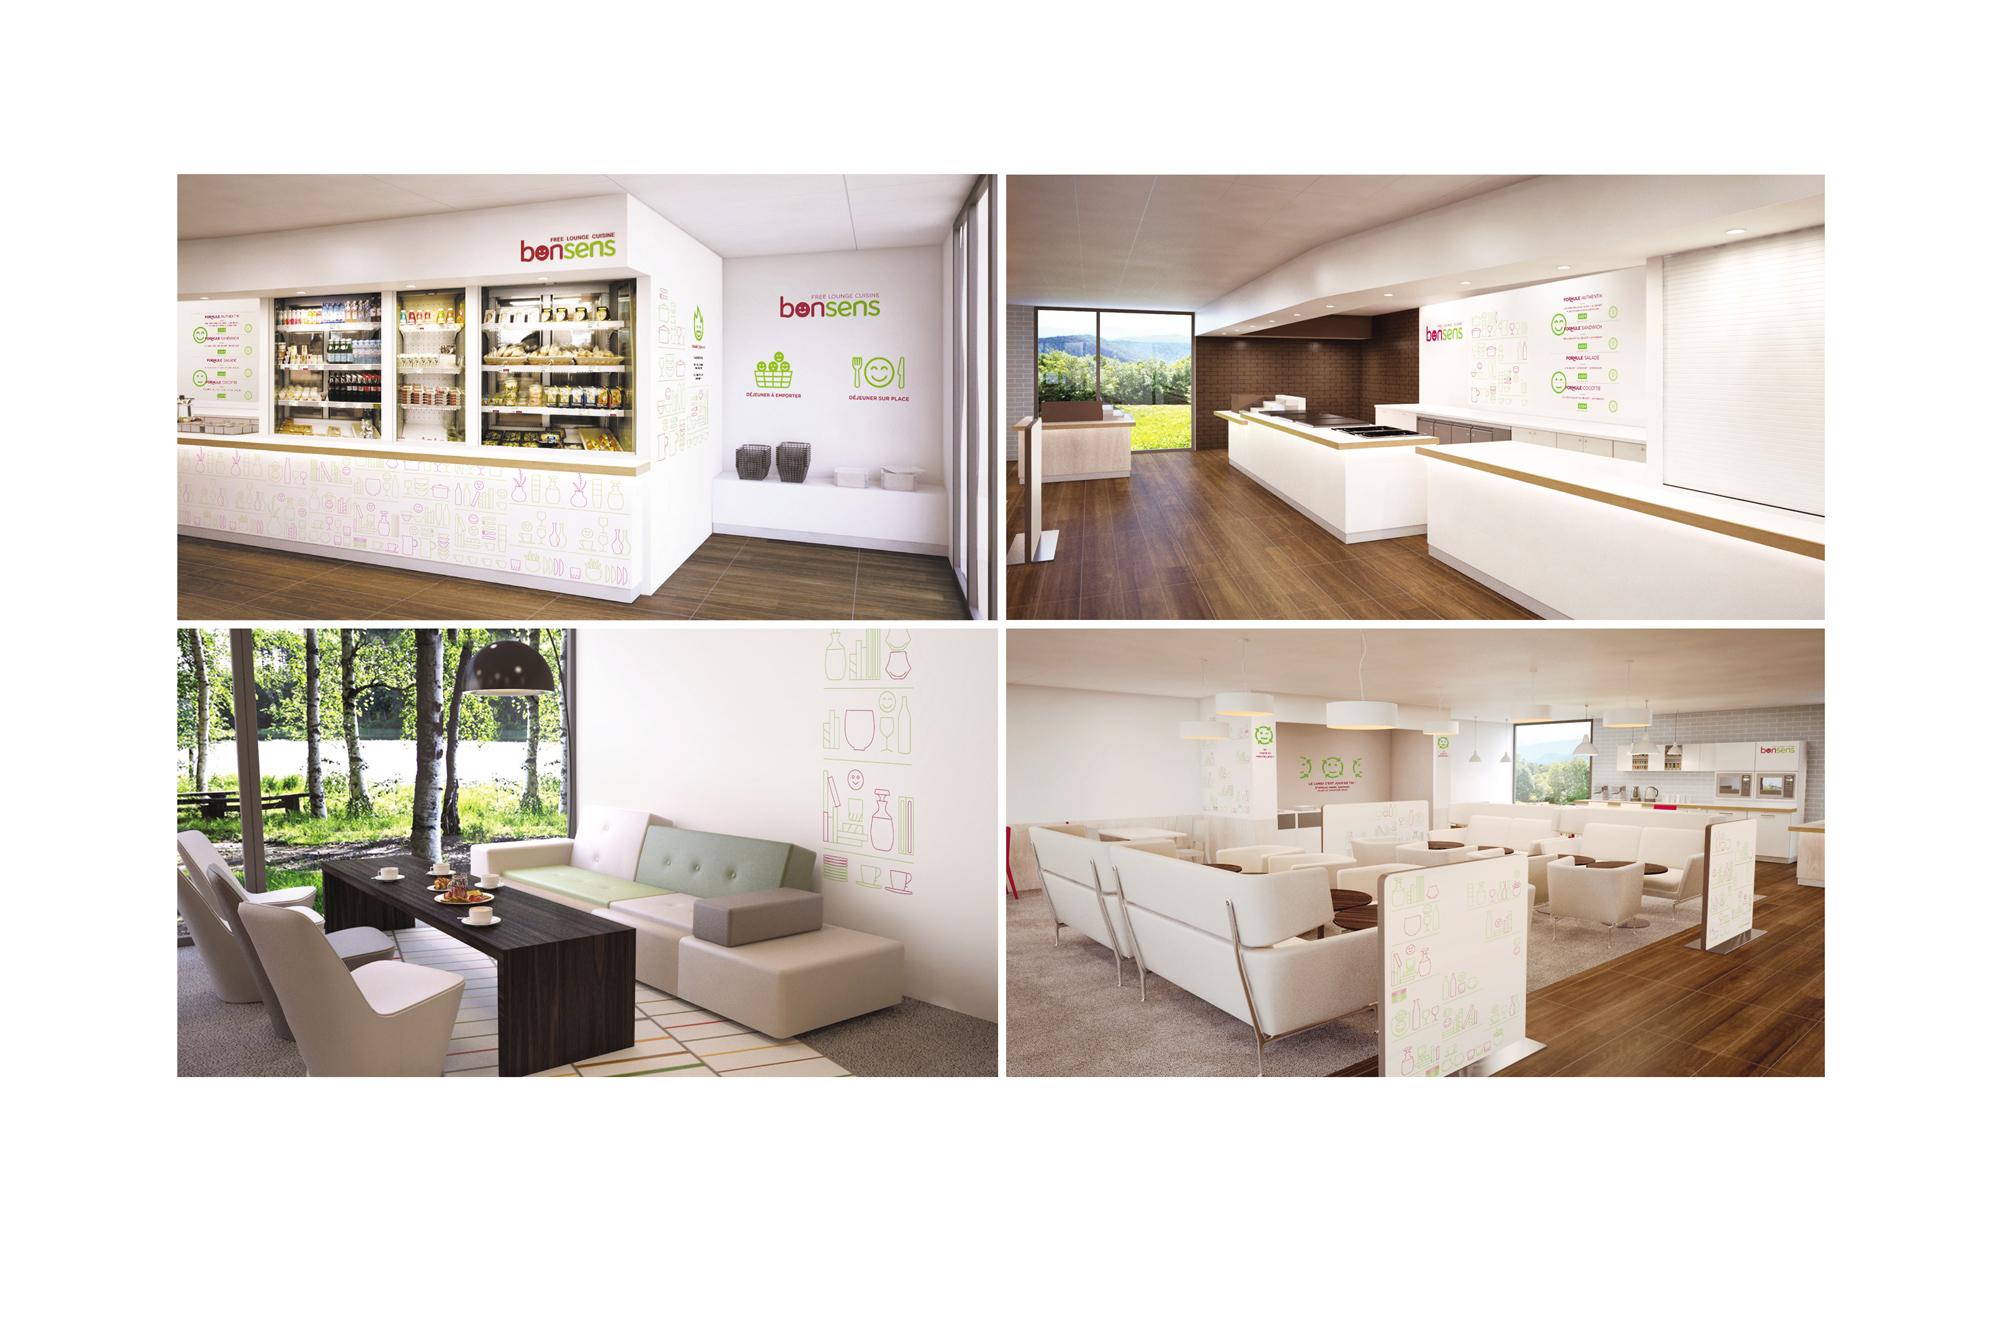 Adrien aymard bonsens free lounge cuisine - Projet atelier cuisine ...